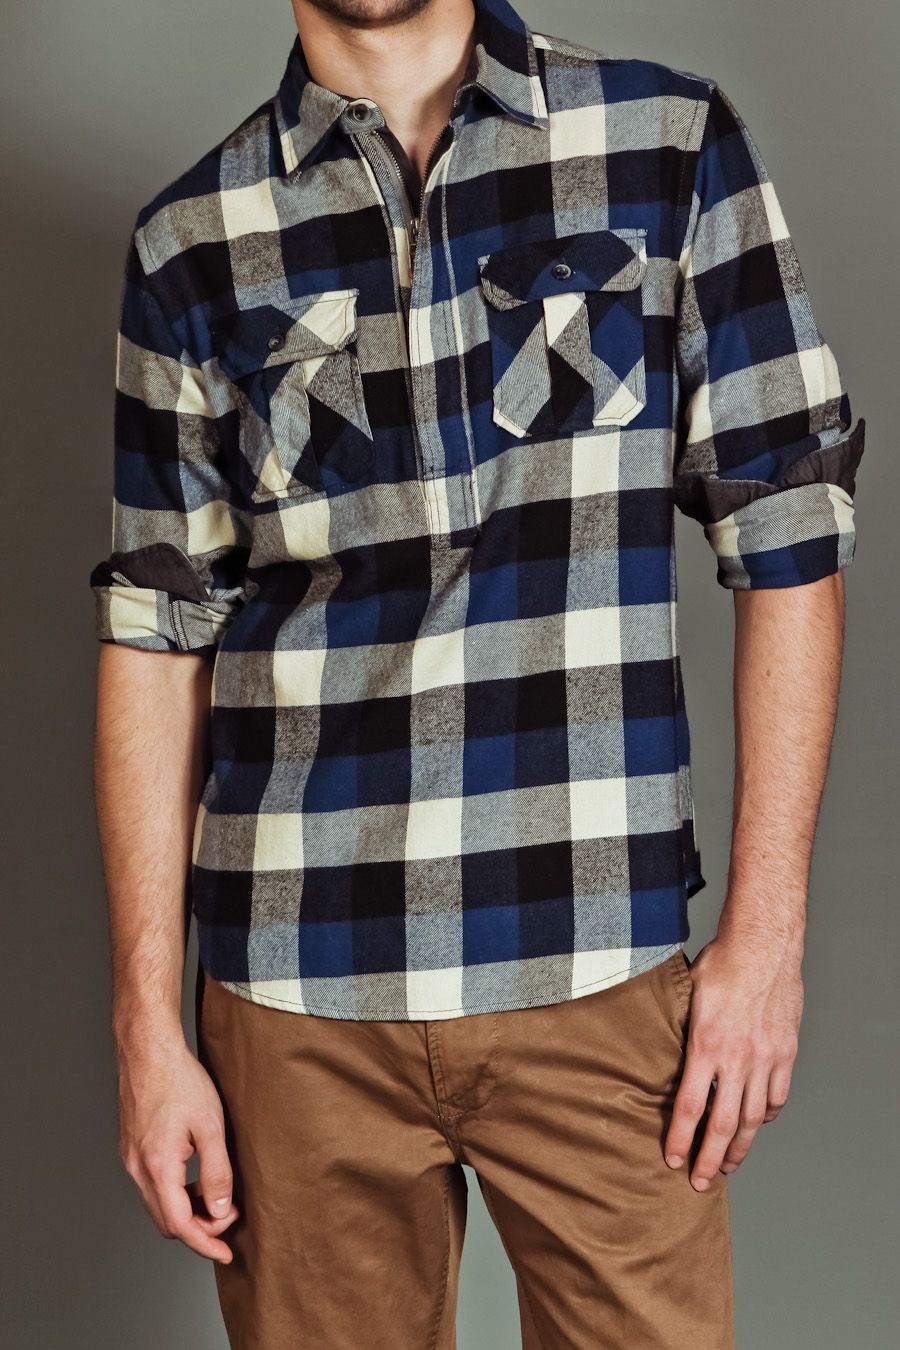 Flannel shirt with khaki pants  Jack Threads JACHS MAX PLAID SHIRT BLUEBLACK   What I should